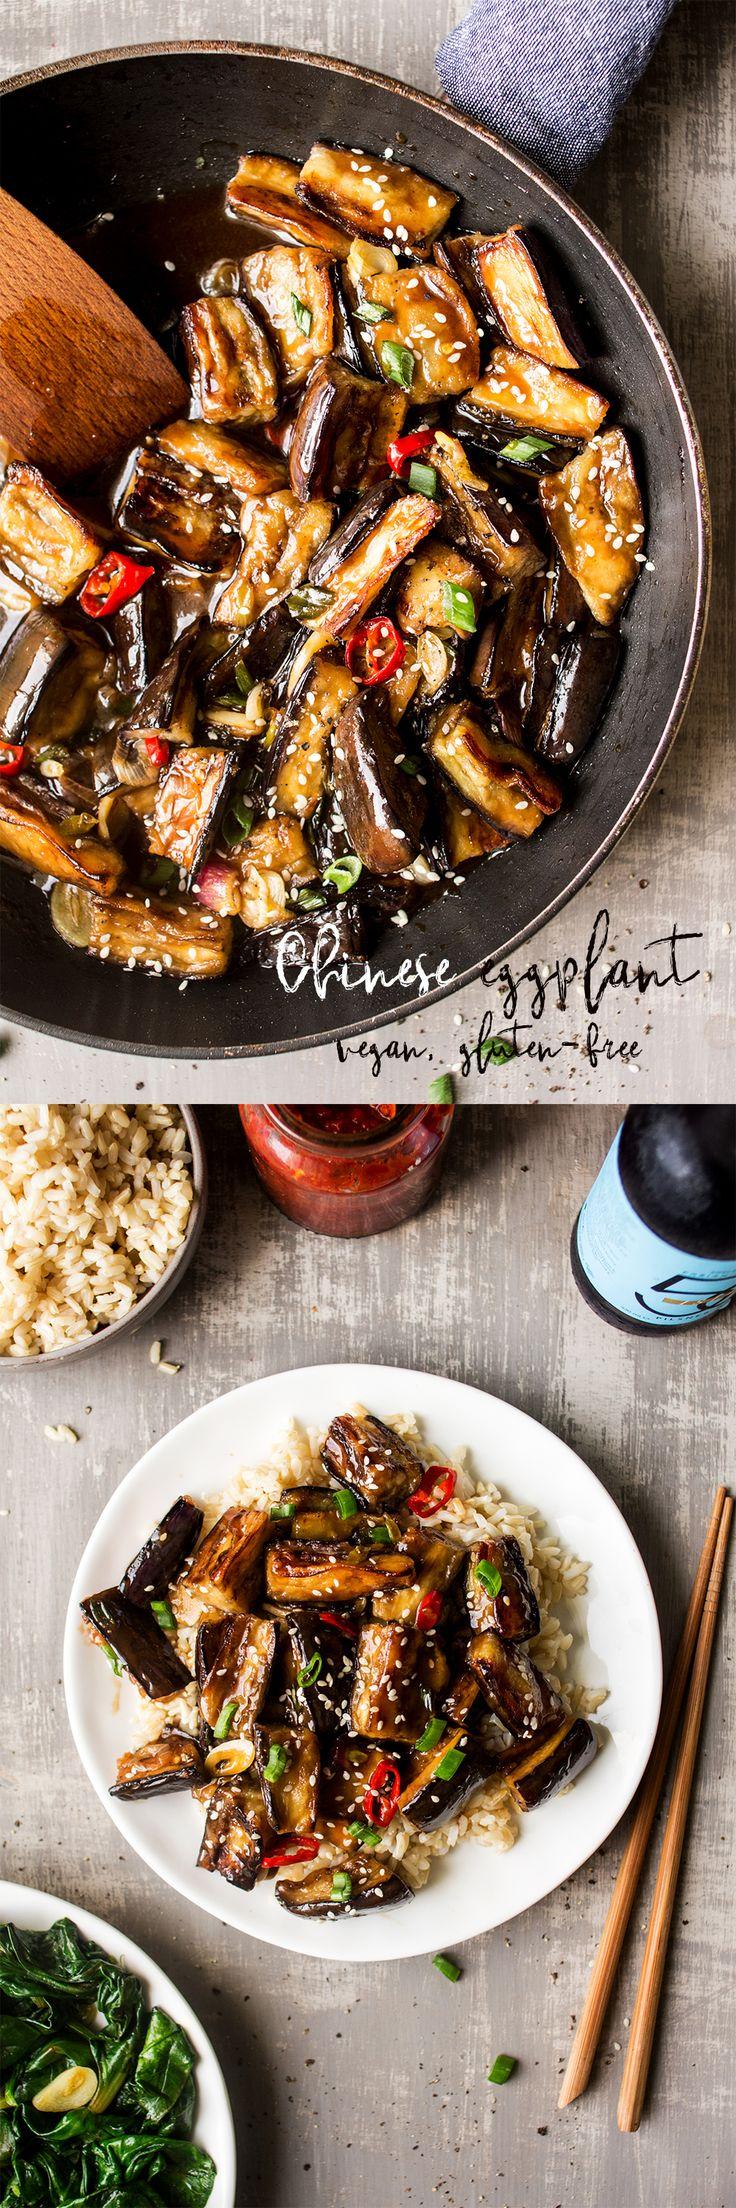 Vegan eggplant chinese stir fry